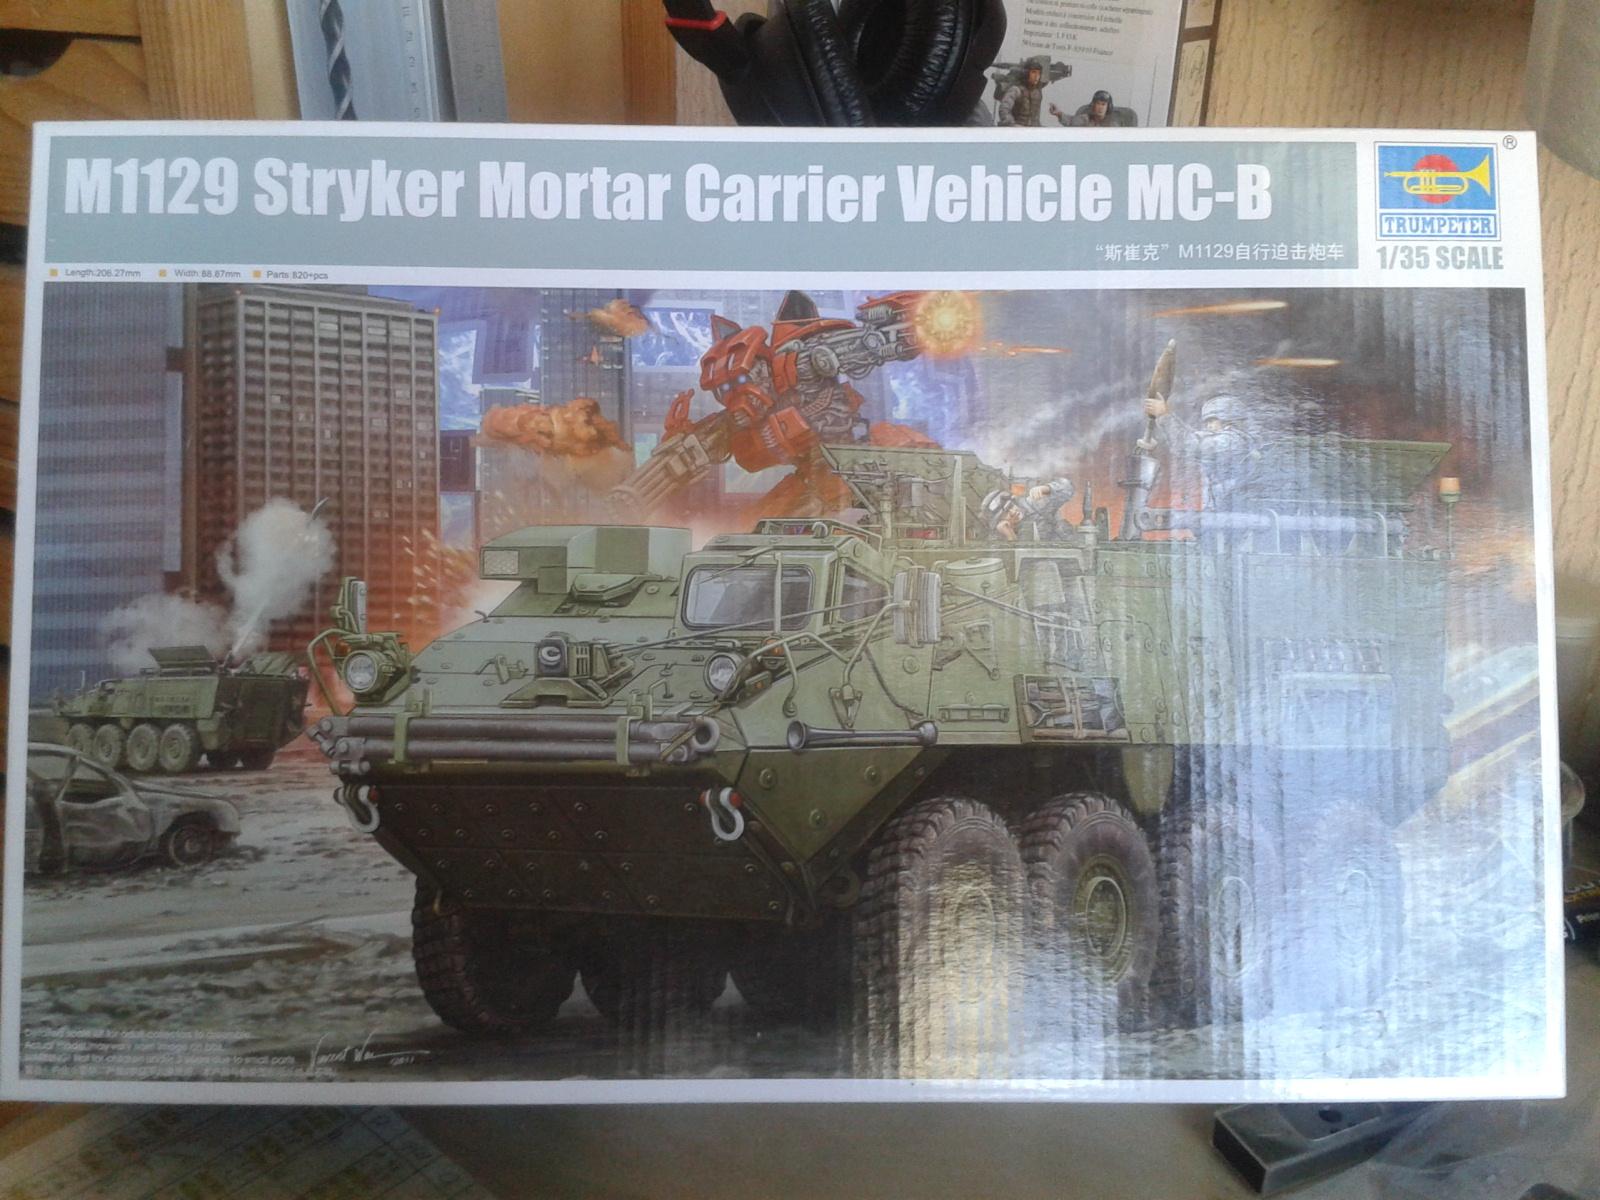 Stryker M1129 Mortar Carrier MC-B ...Montage terminé !!!! 20130413115718